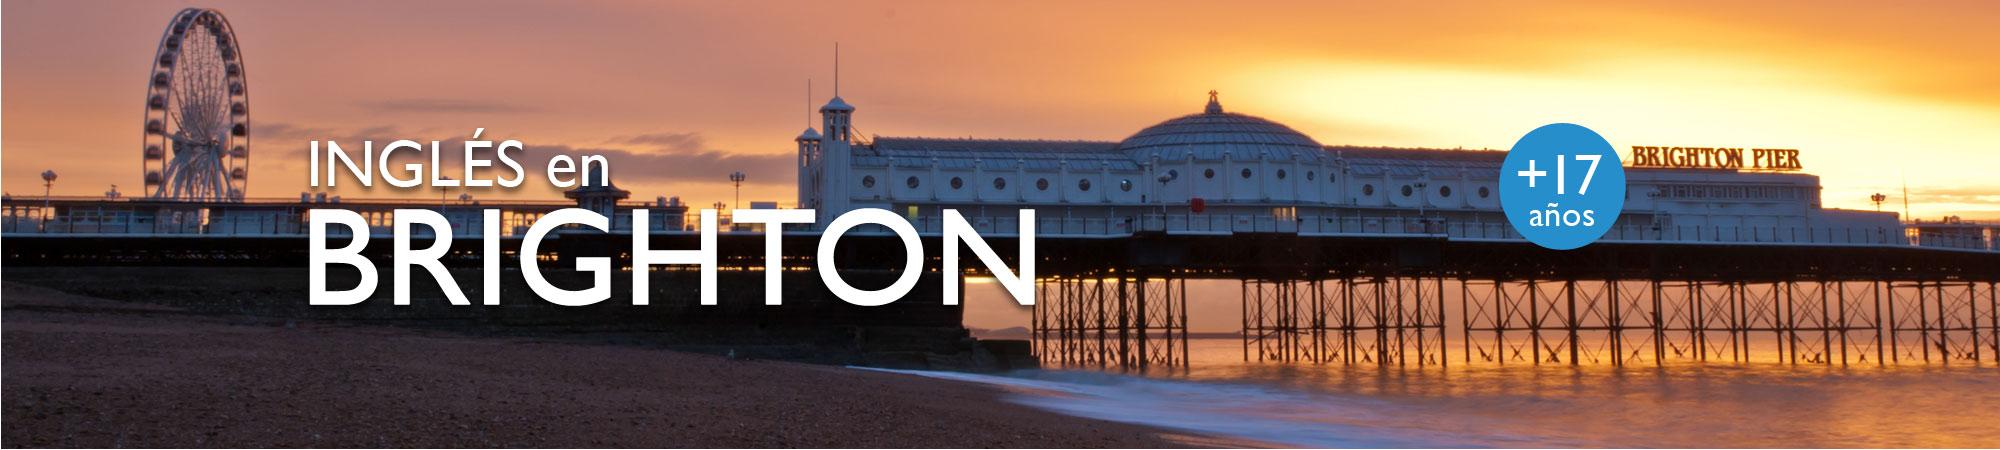 Cursos estudiar ingles en Brighton Inglaterra Midleton School